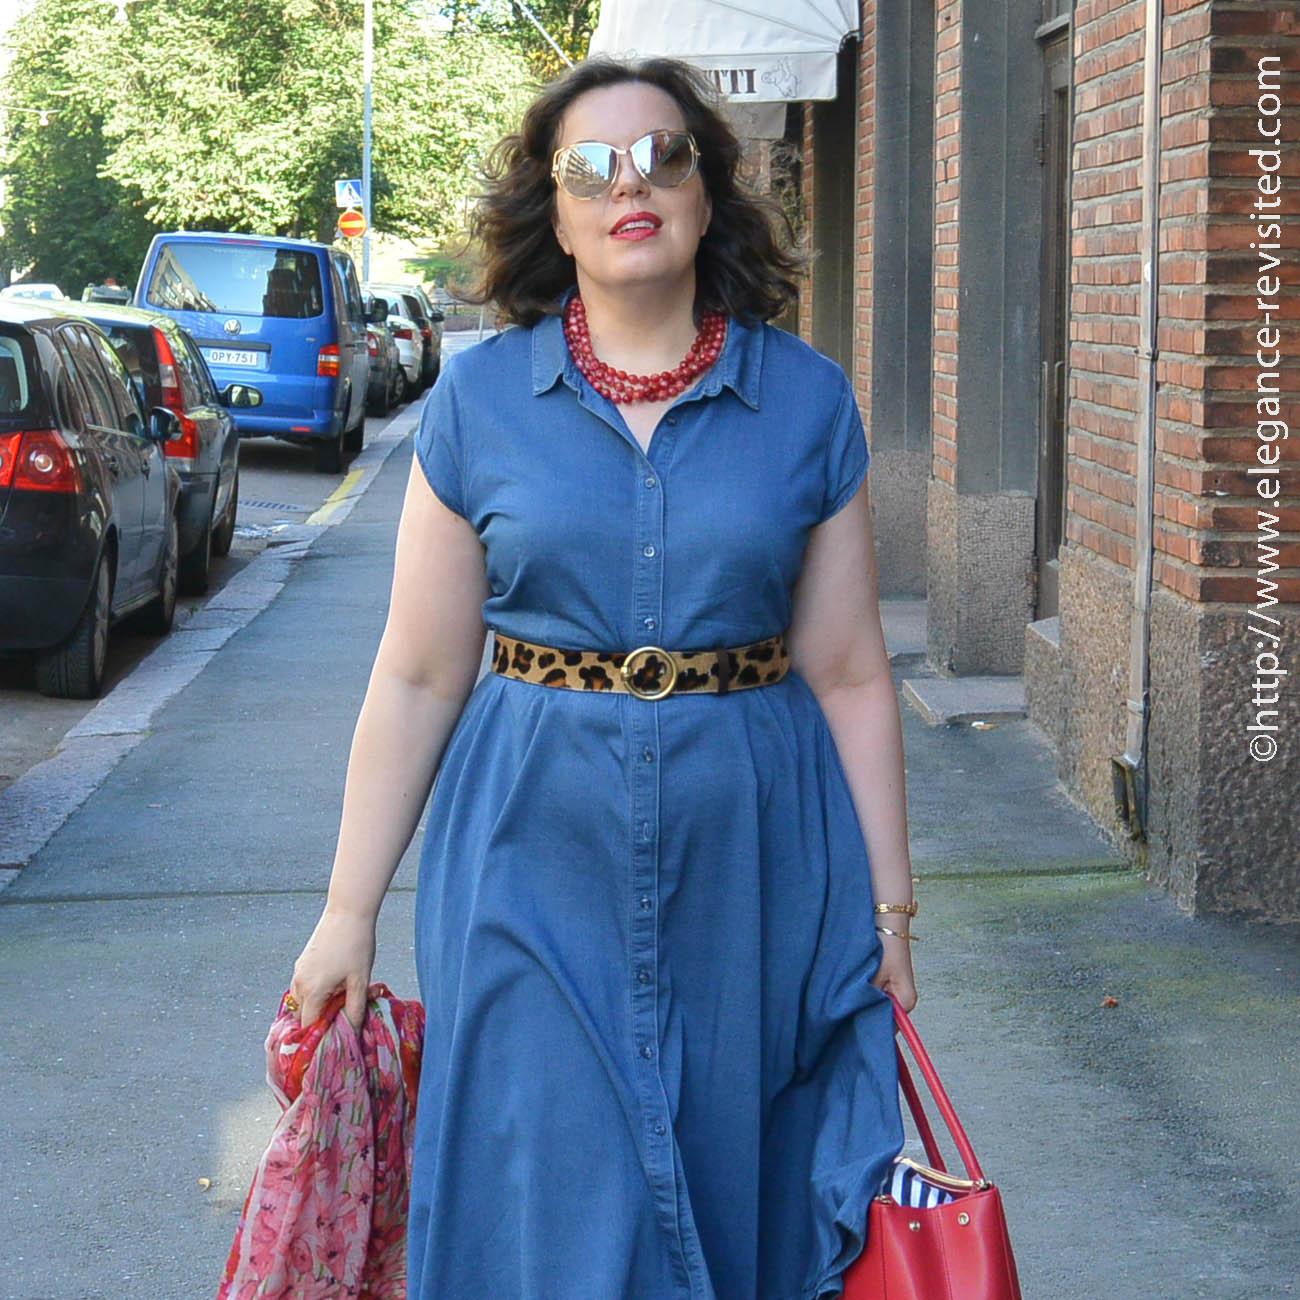 accessorizing a dress